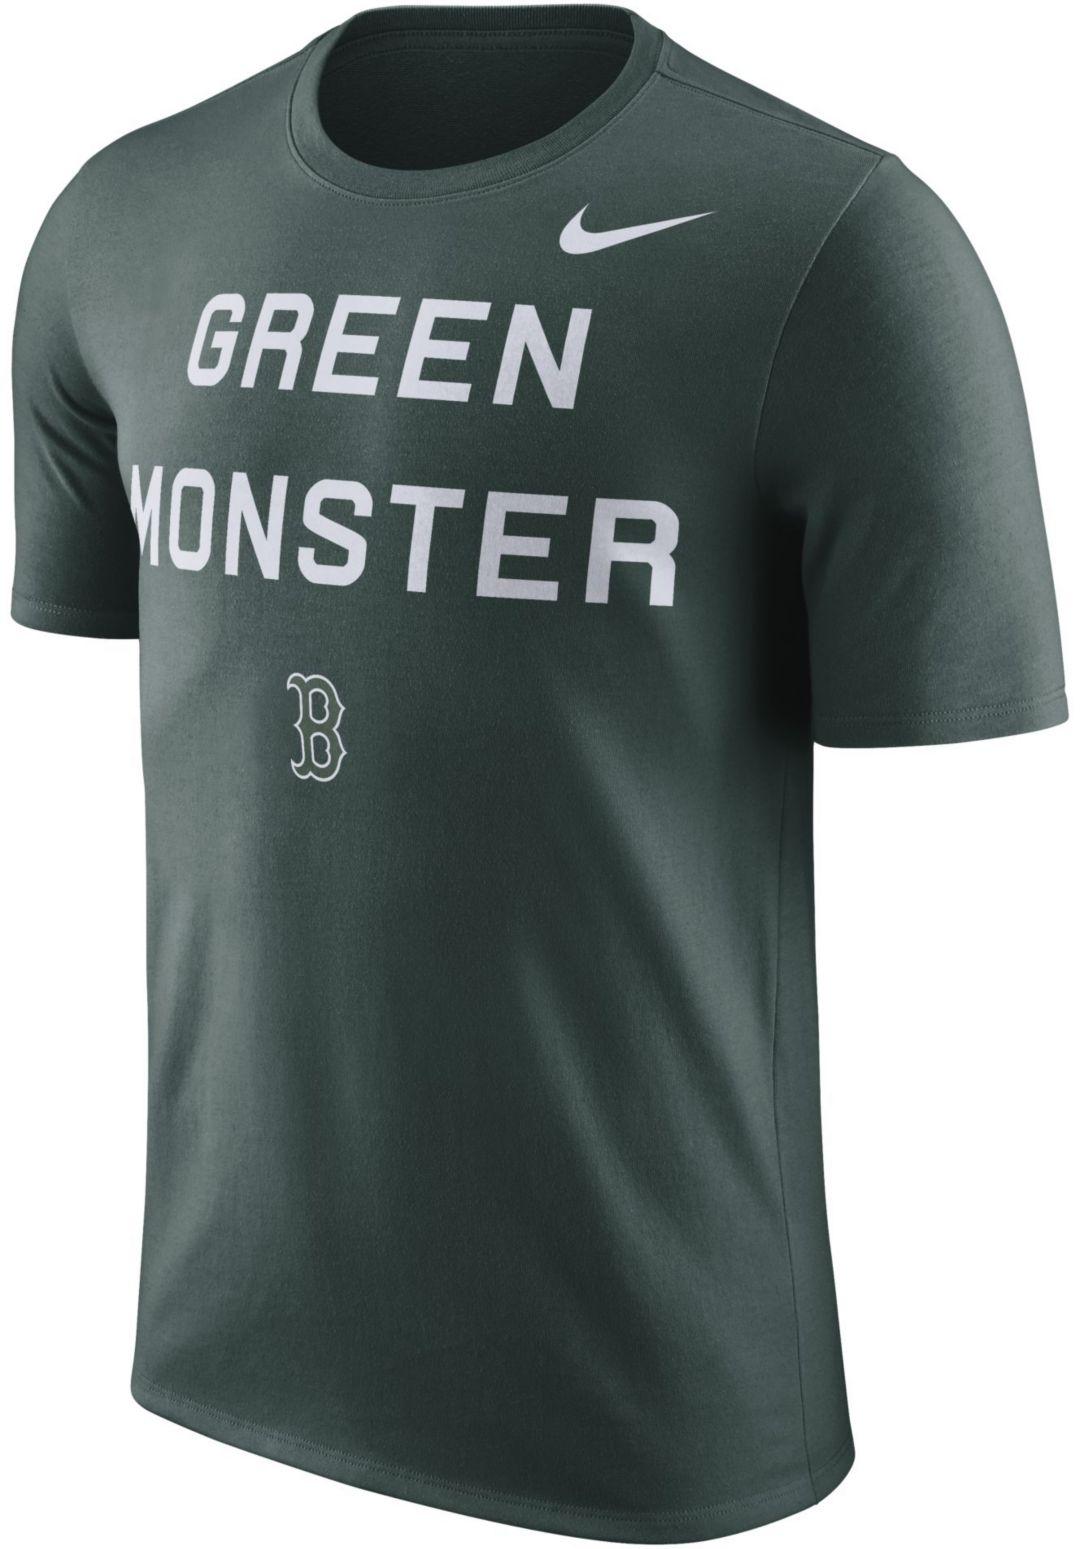 new product af48b b30a5 Nike Men's Boston Red Sox Dri-FIT